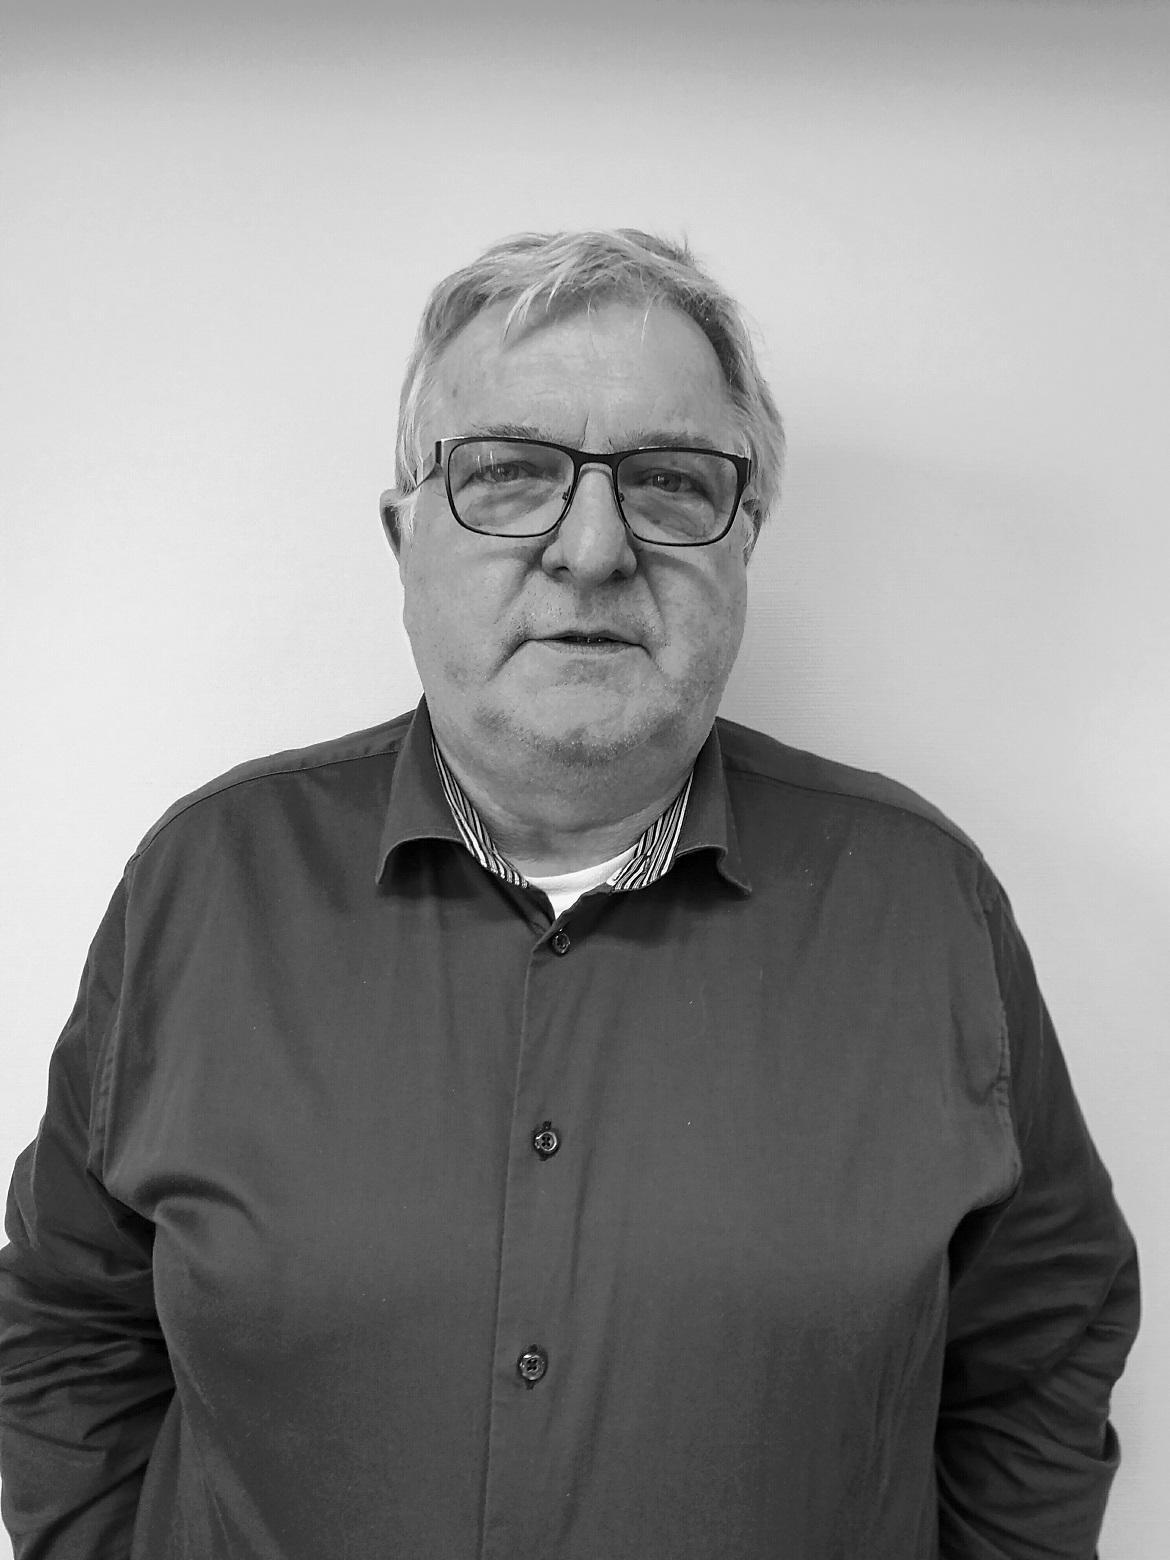 Arne Paul Slotsvik